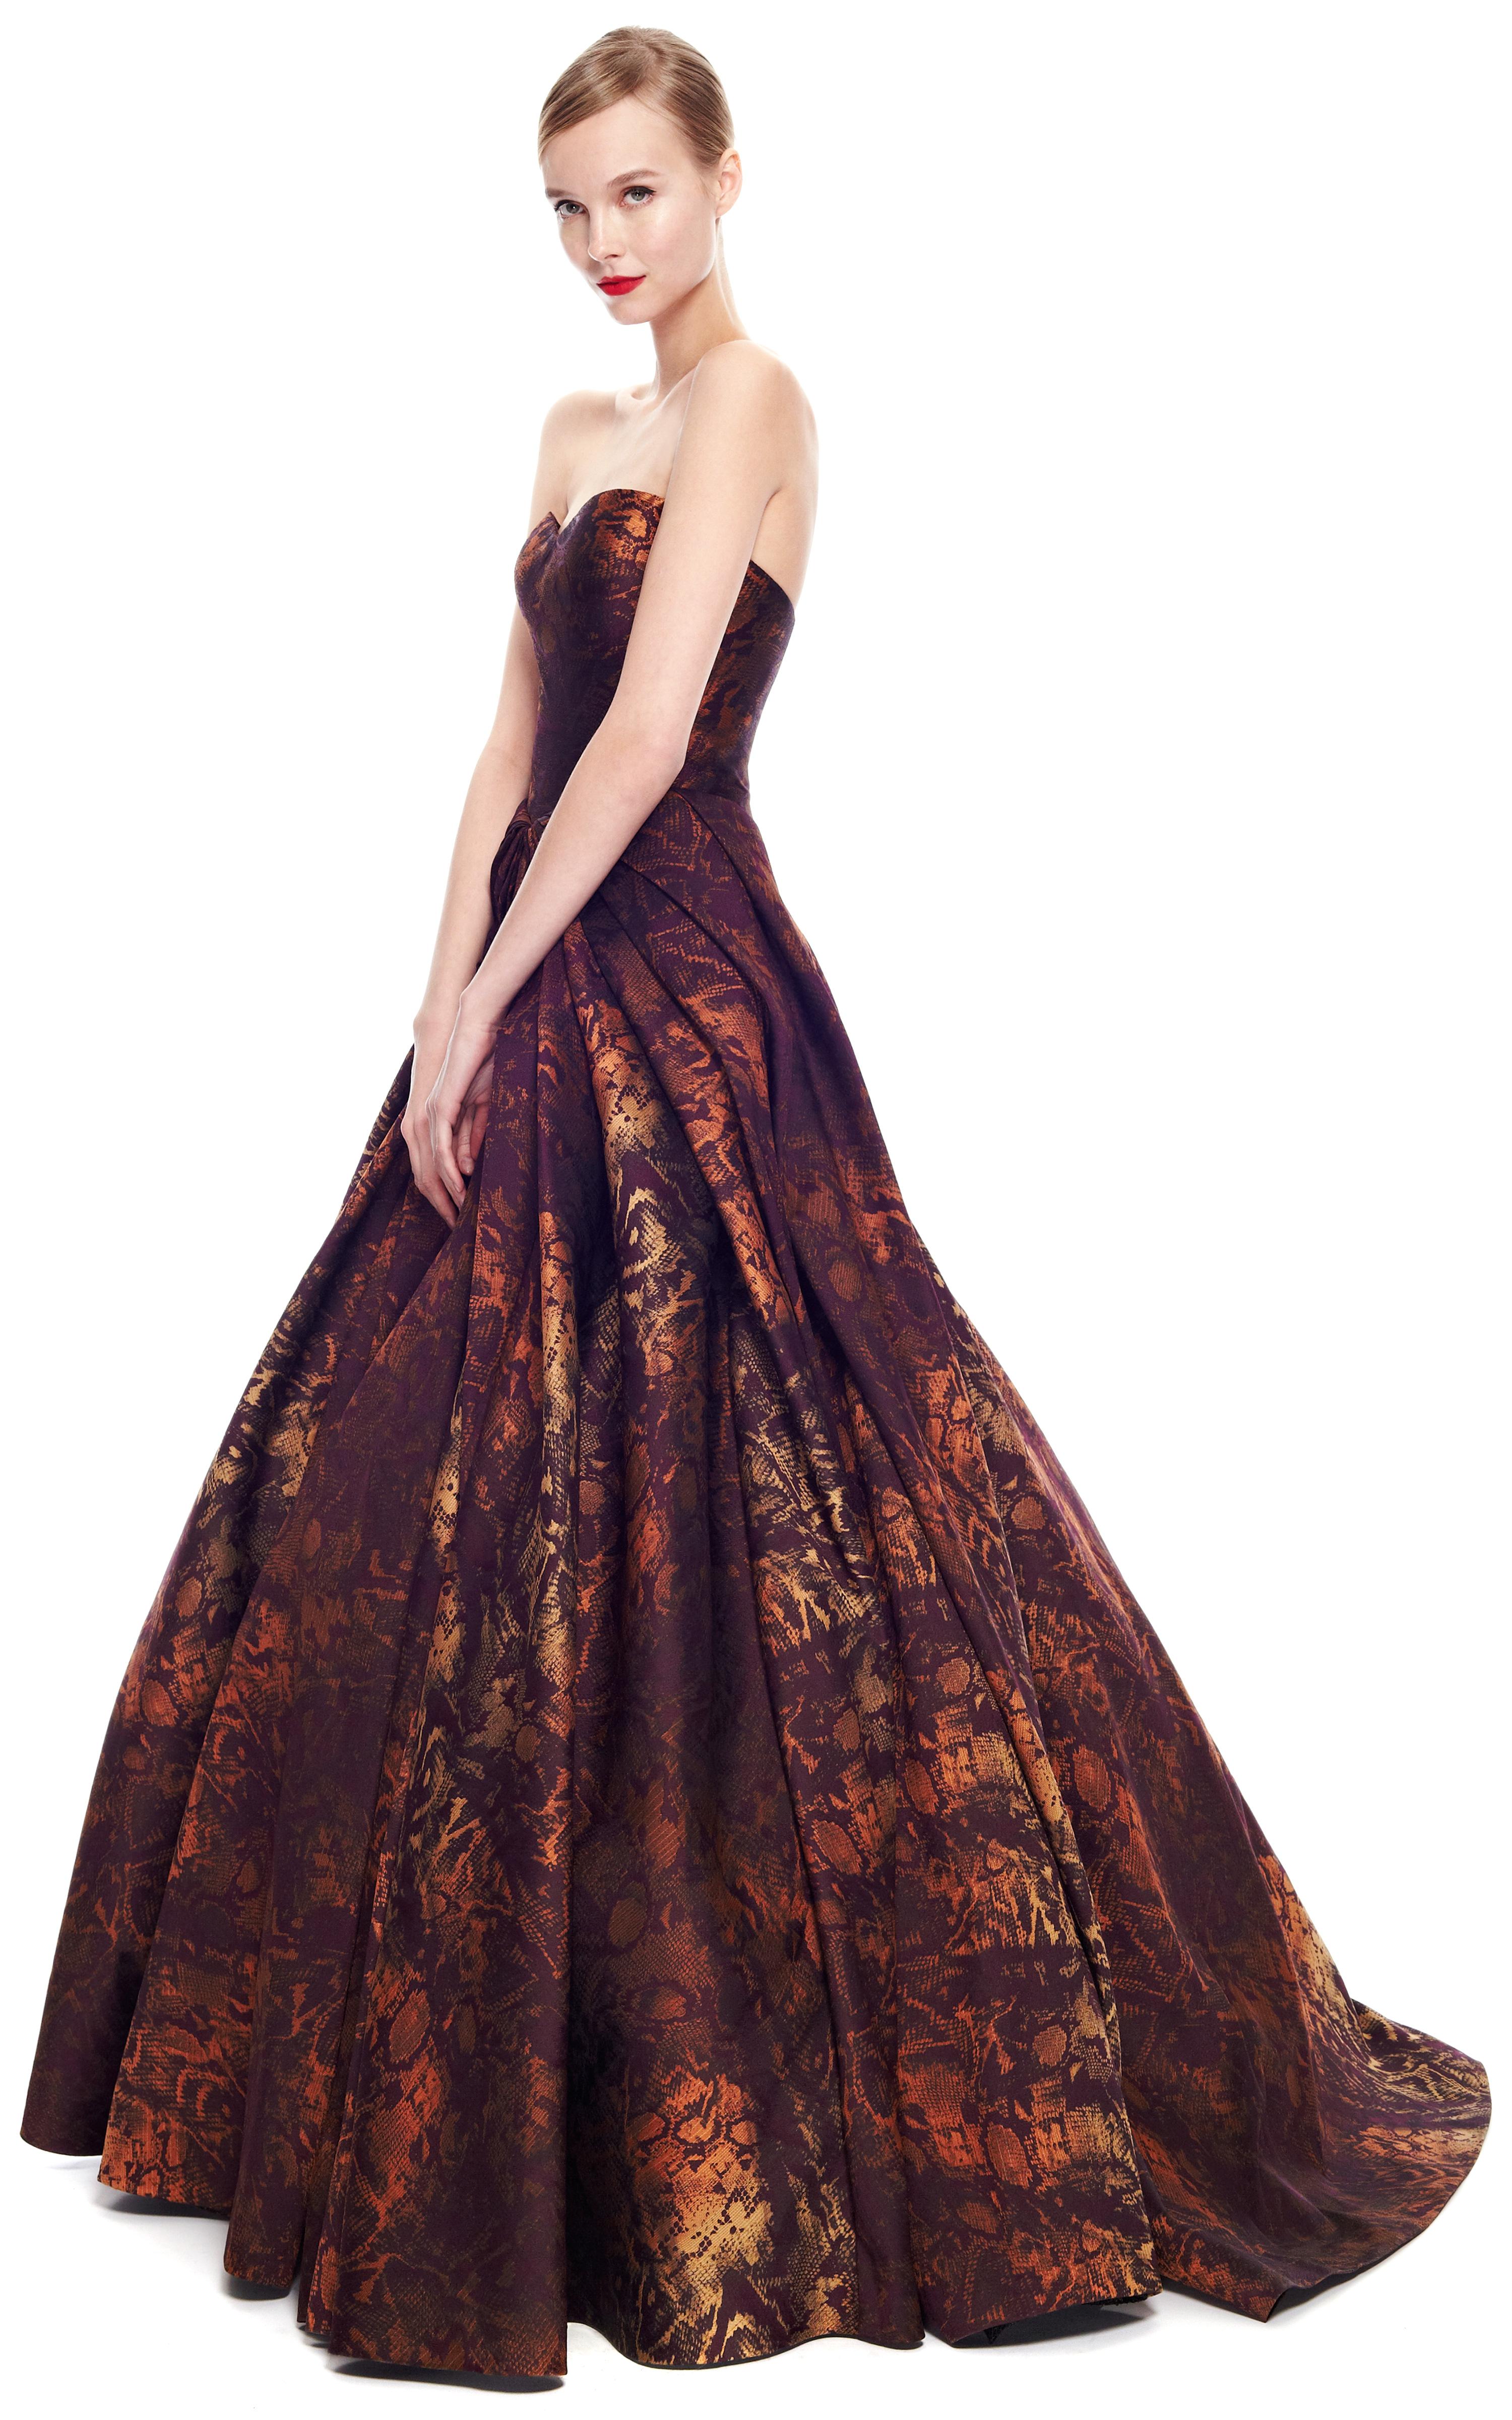 b50d36b2ab2 Lyst - Zac Posen Python Floral Jacquard Strapless Gown